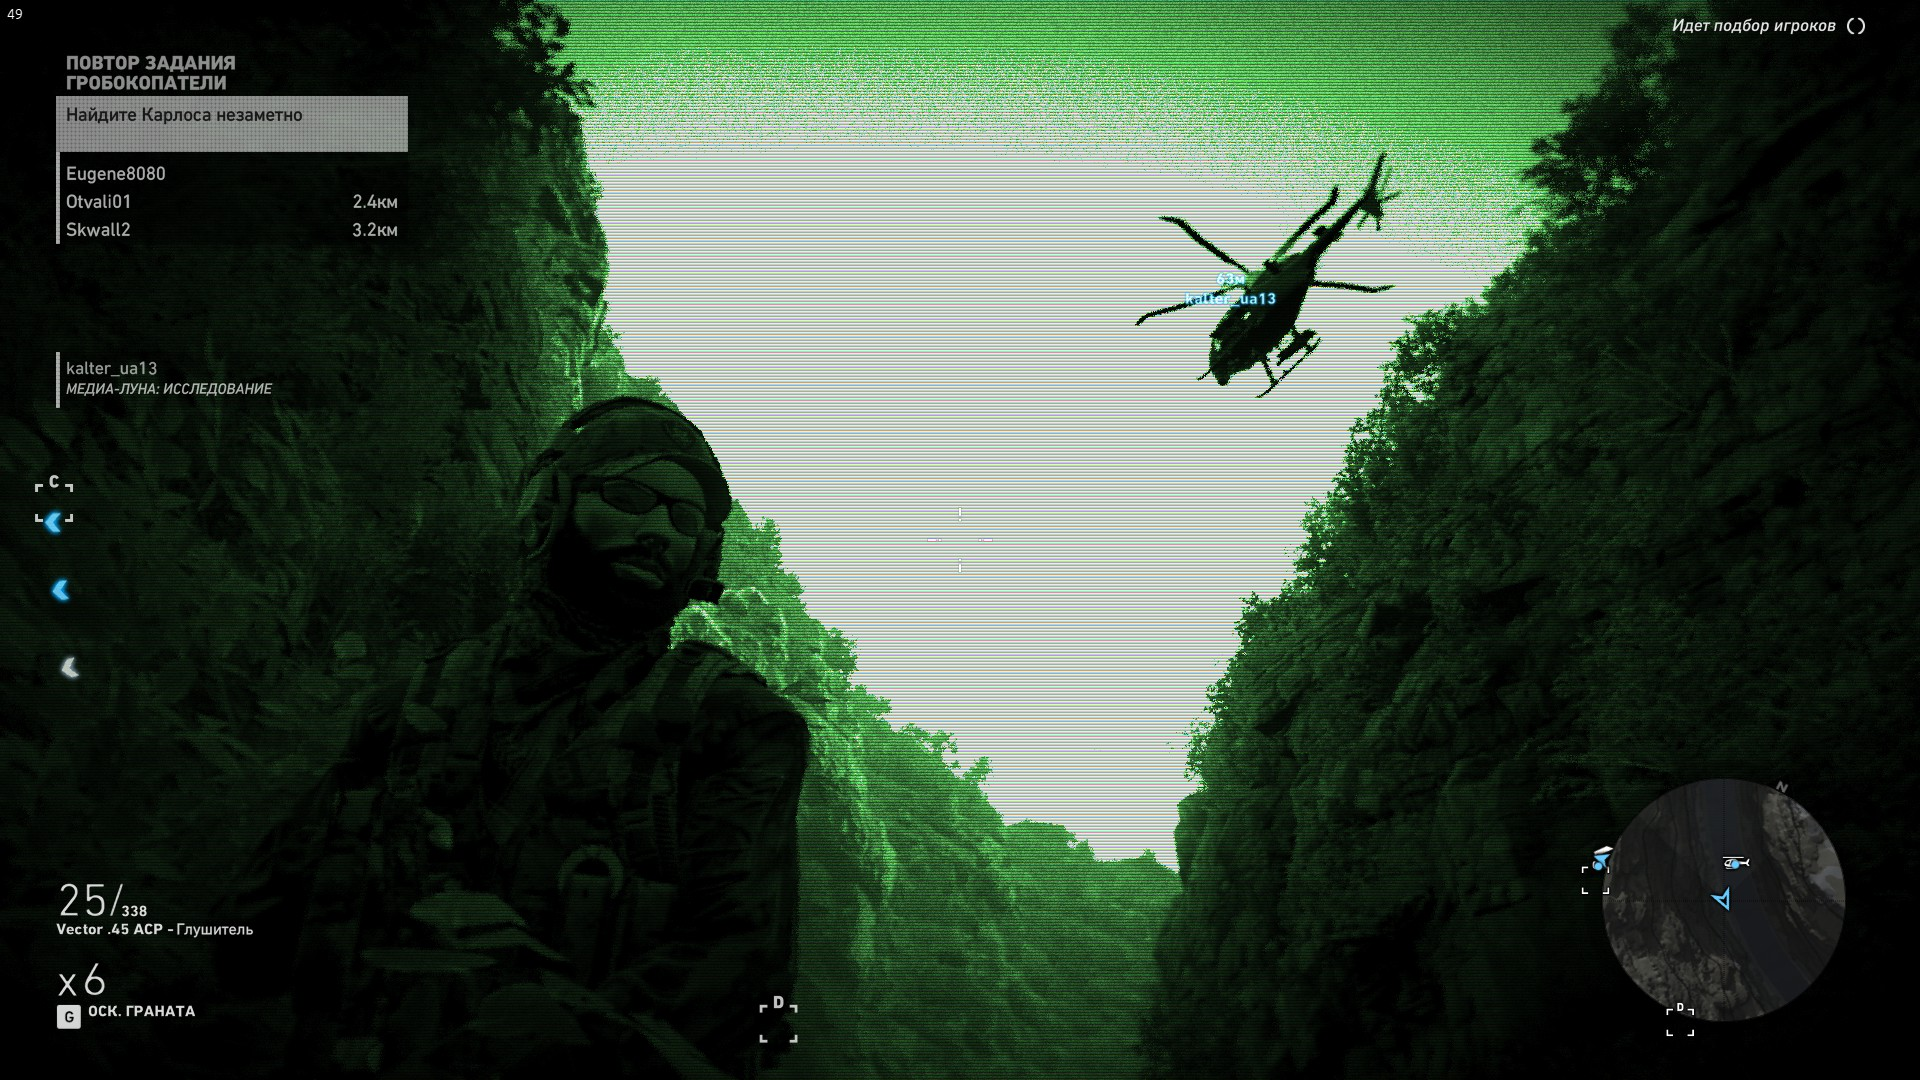 Tom Clancy's Ghost Recon® Wildlands2017-3-18-23-33-32.jpg - Tom Clancy's Ghost Recon: Wildlands